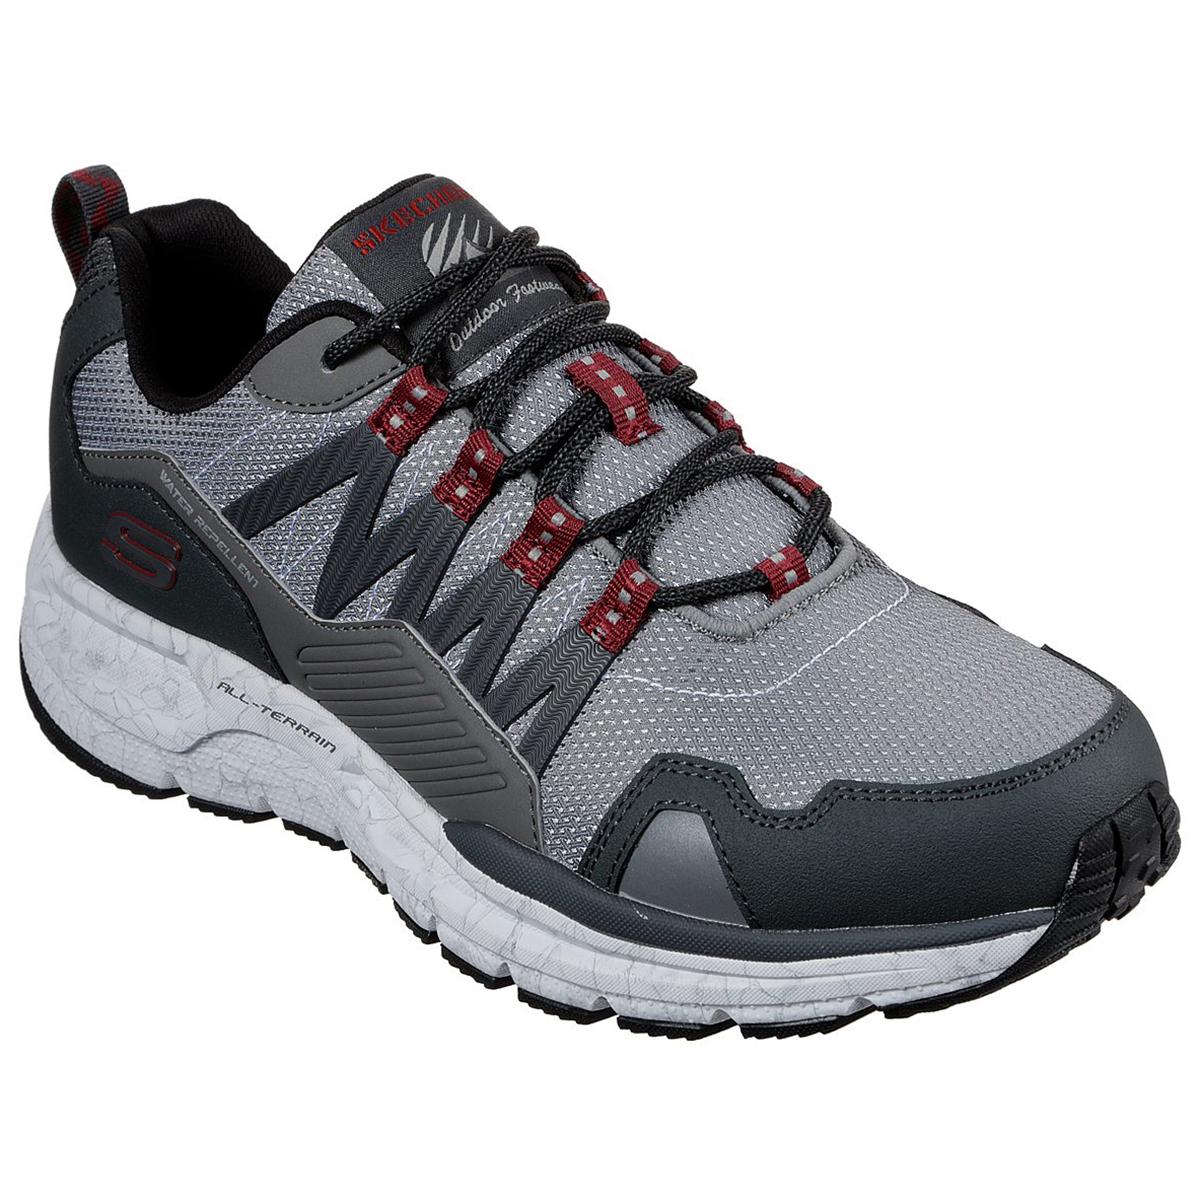 Skechers Men's Escape Plan 2.0 Ashwick Shoes, Wide - Black, 9